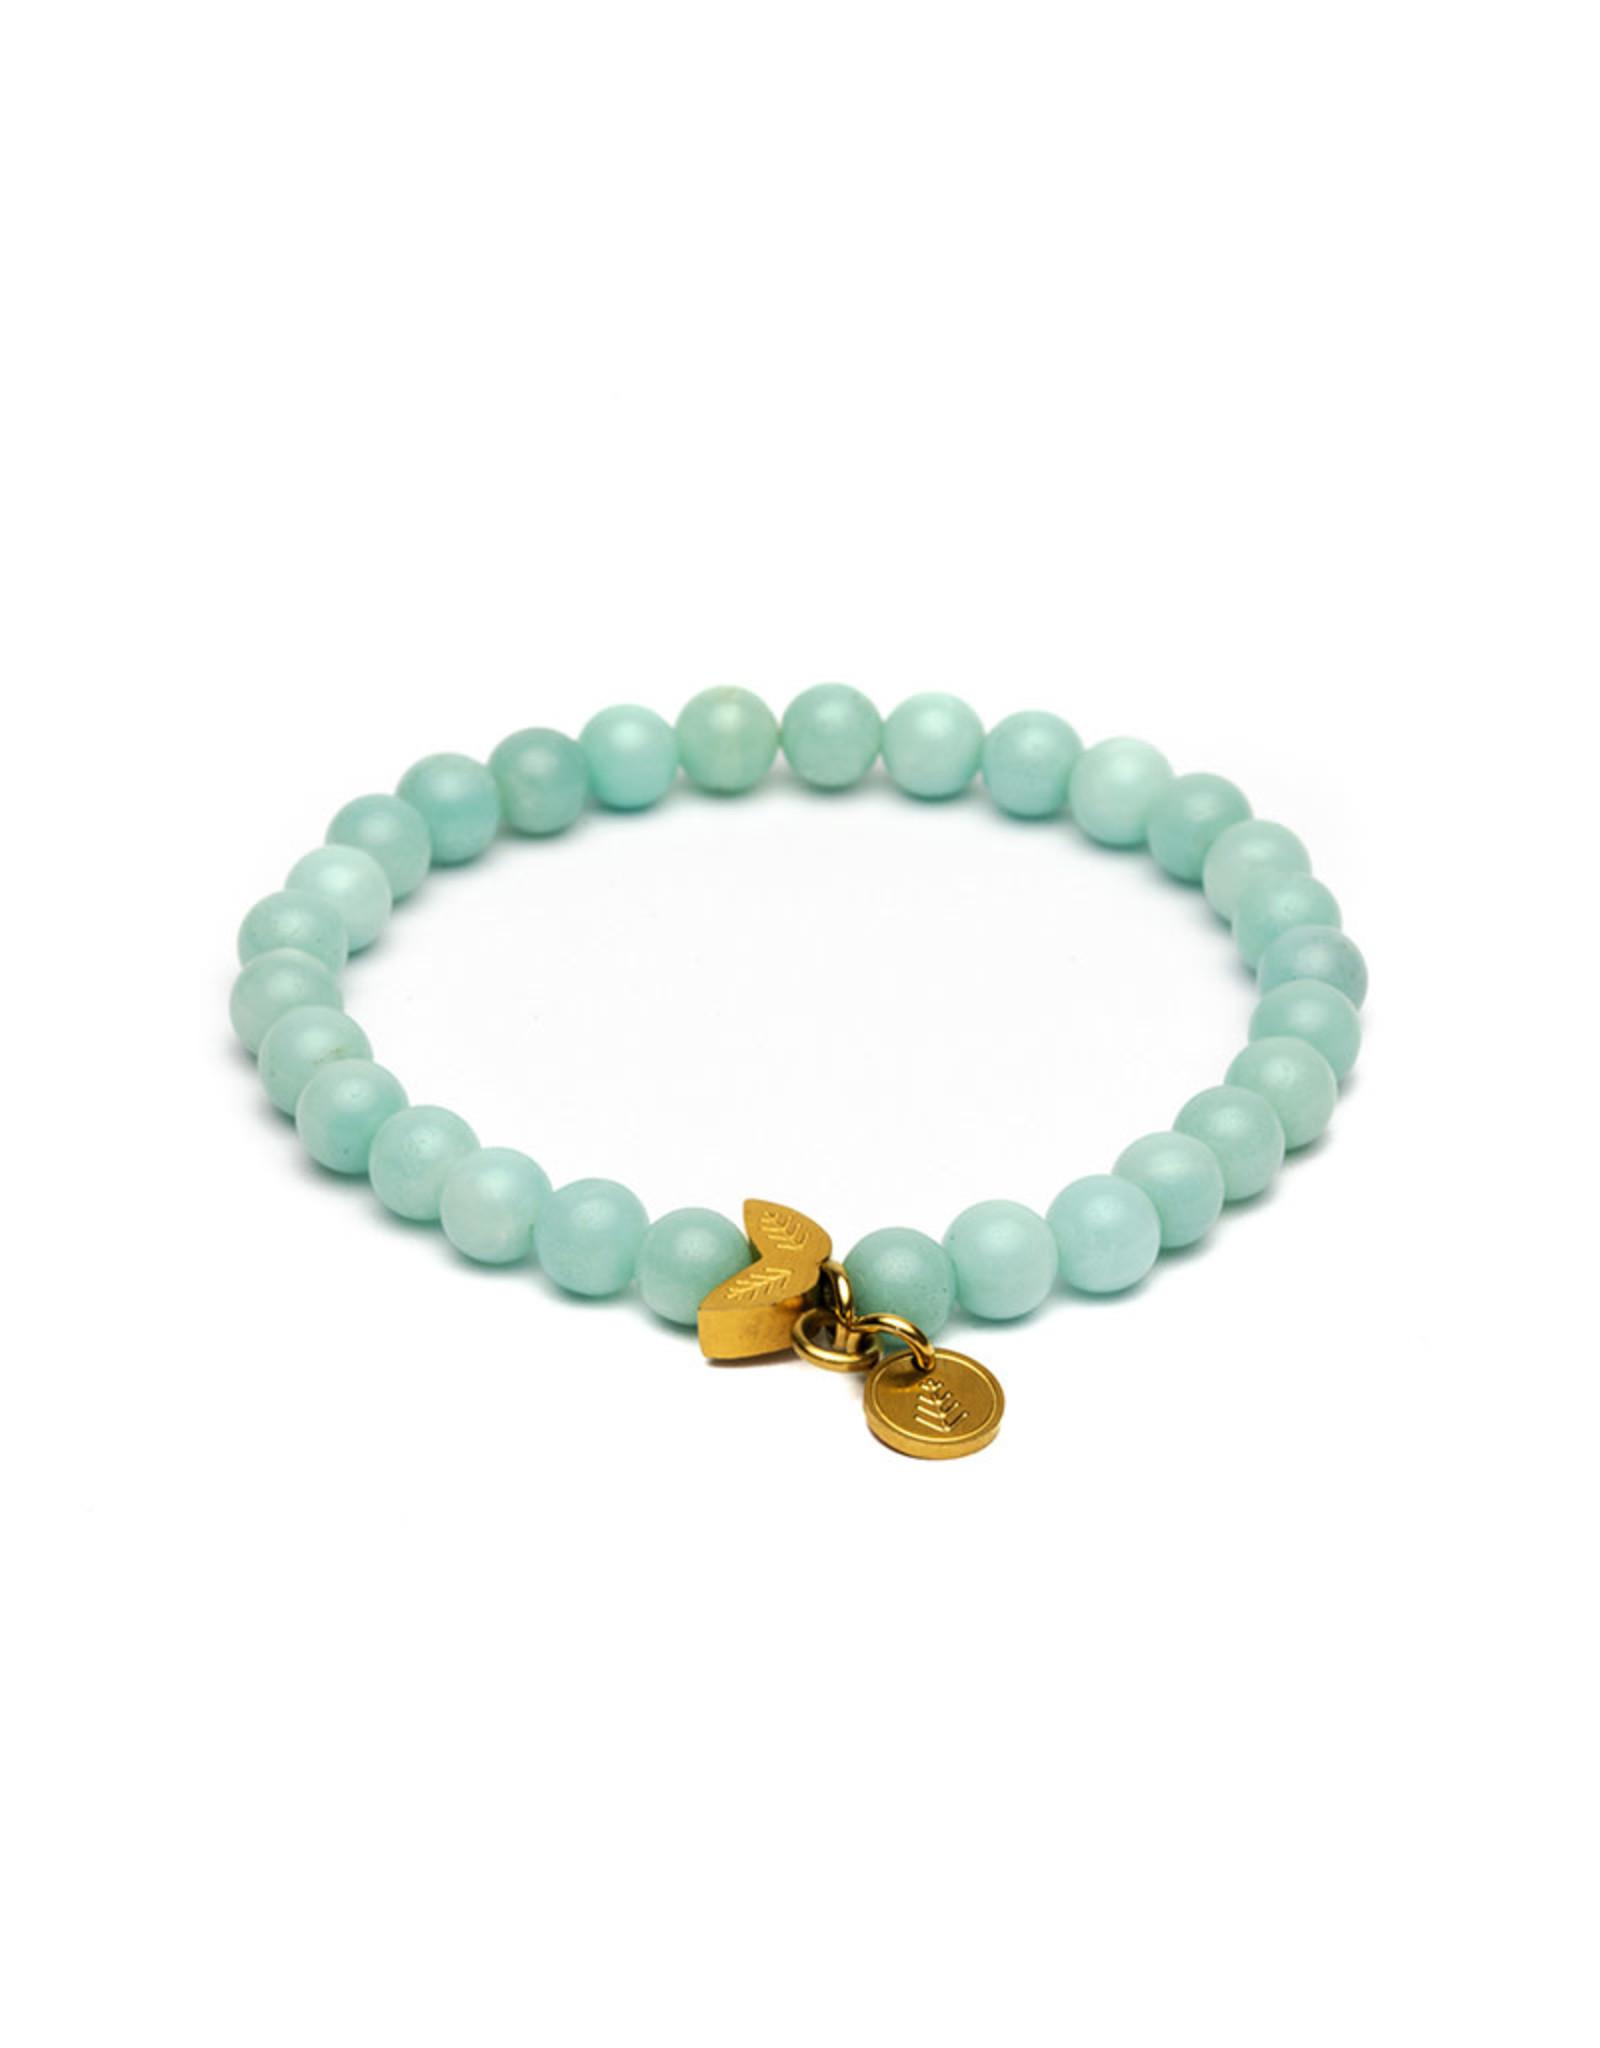 Didyma Armband Didyma NE4S Nea Turquoise Amazonite Small